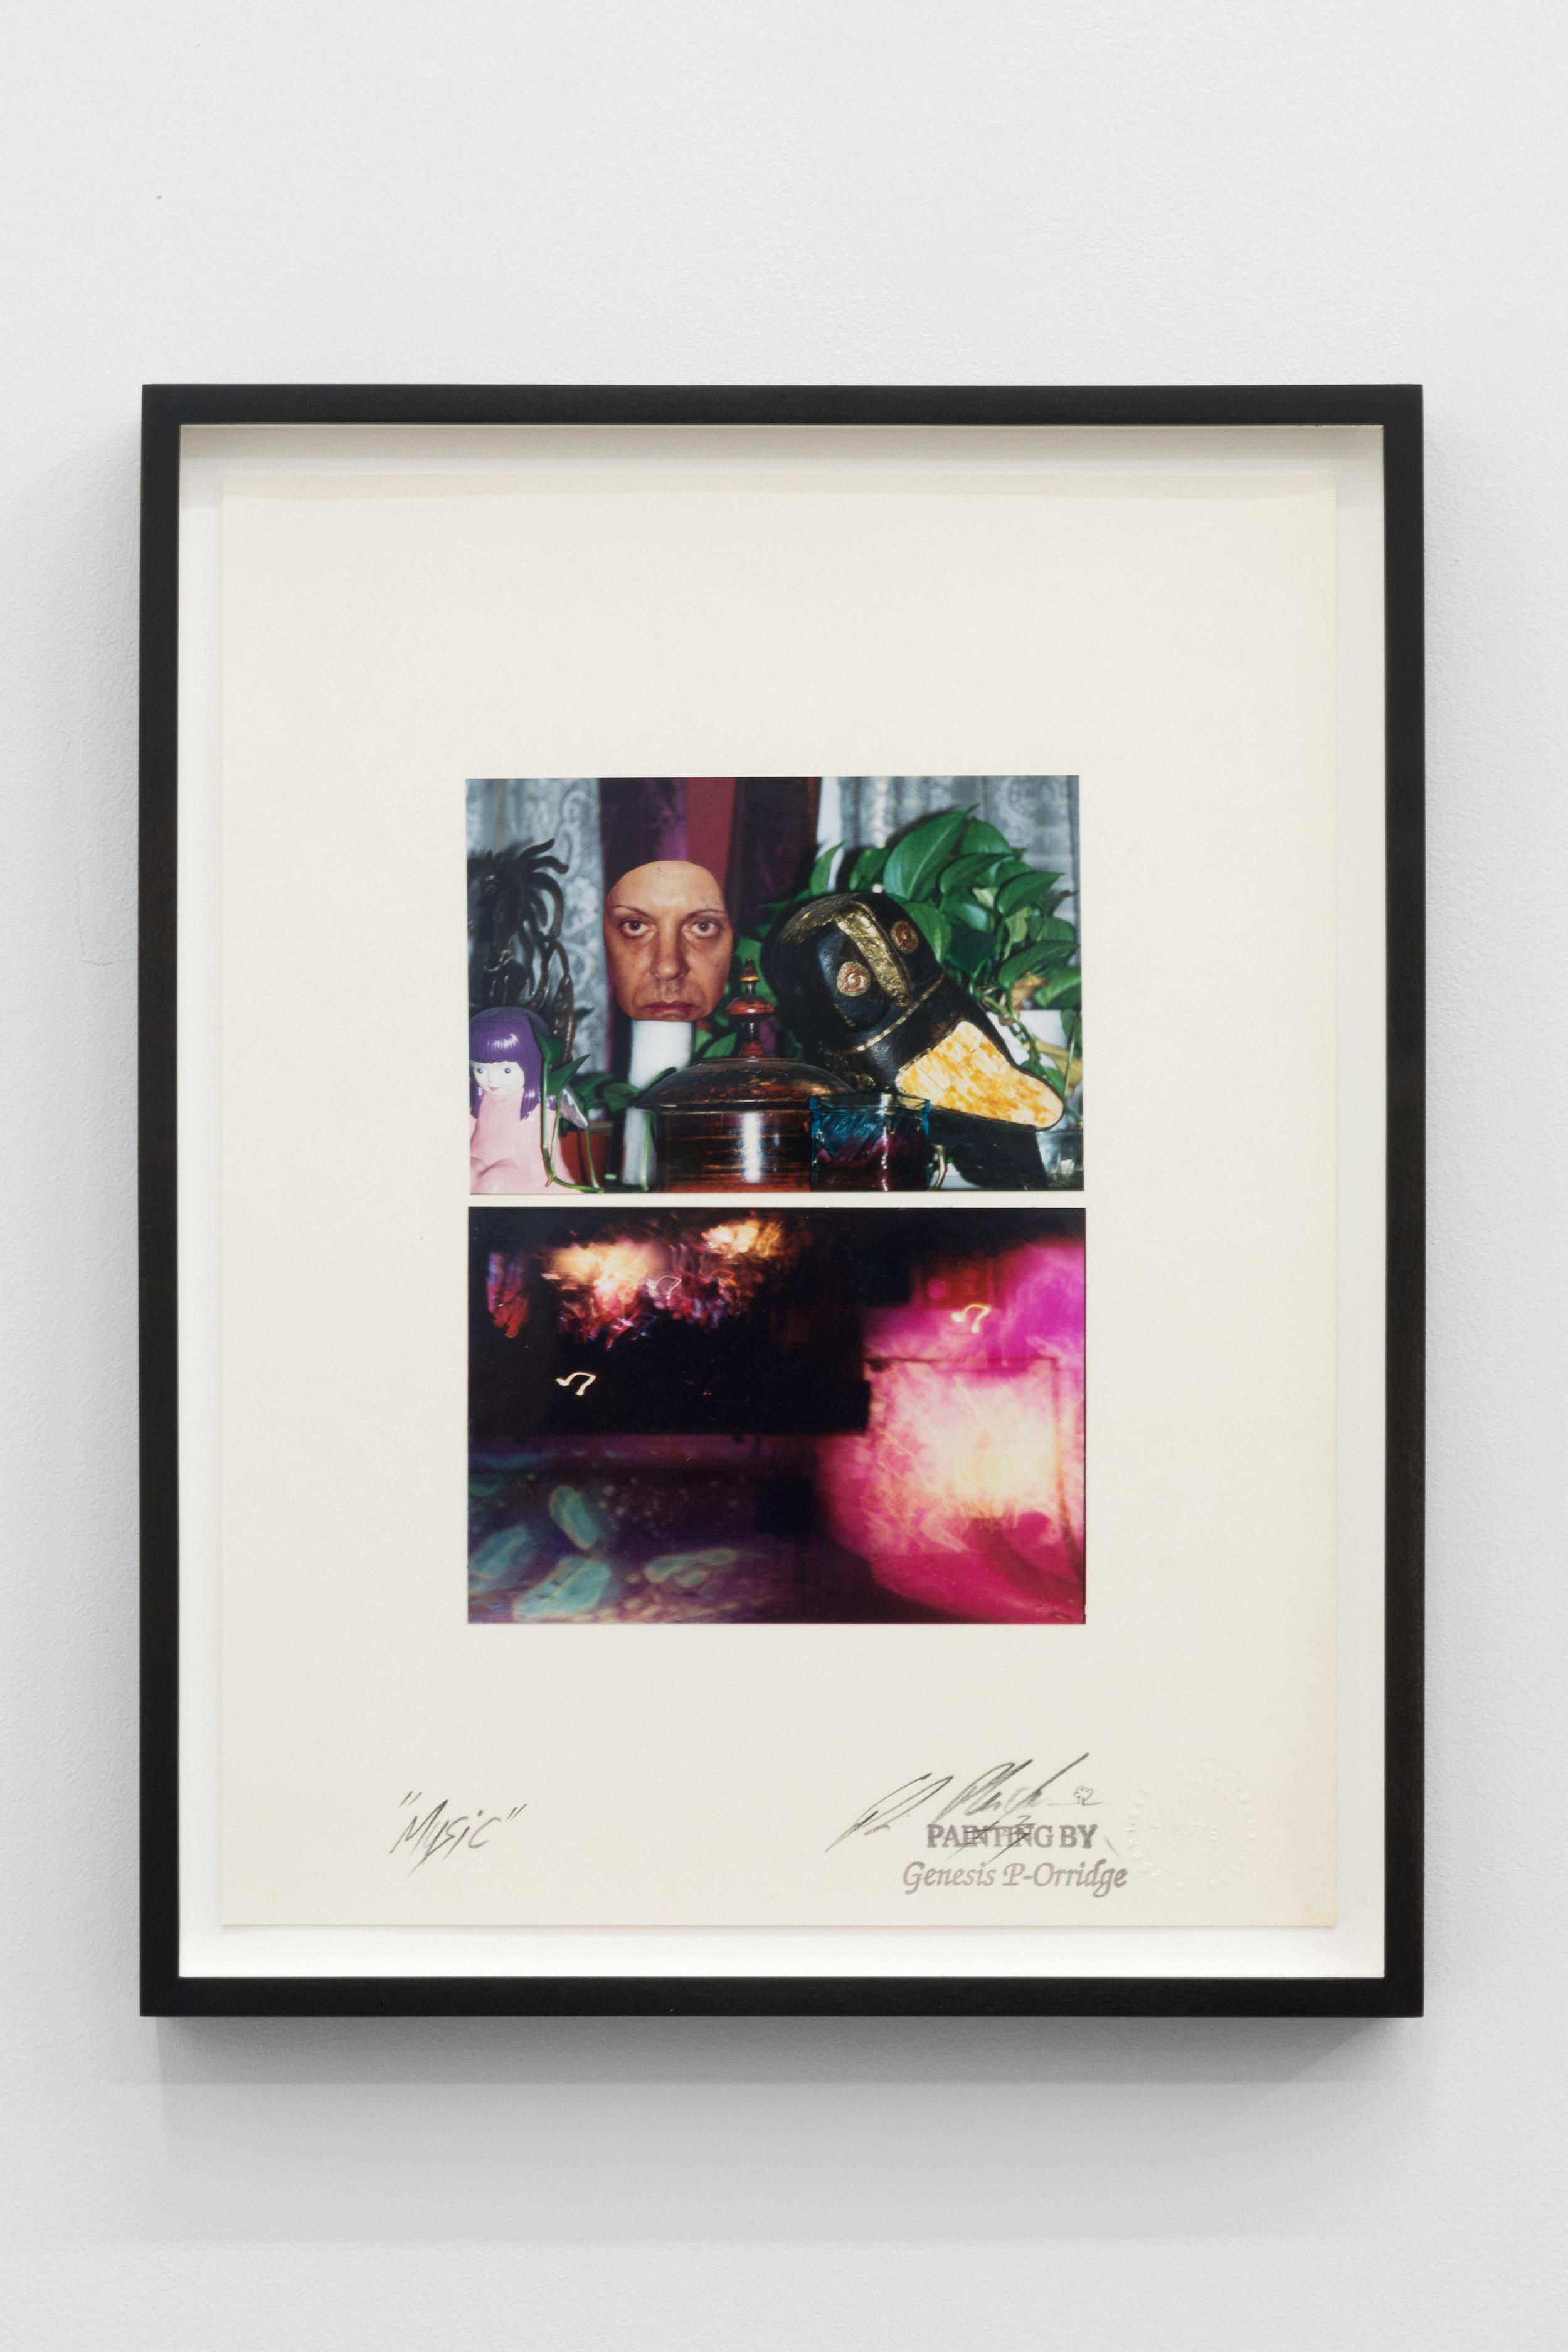 Genesis BREYER P-ORRIDGE,  Music , 2002, Mixed Media, 14 x 11 in